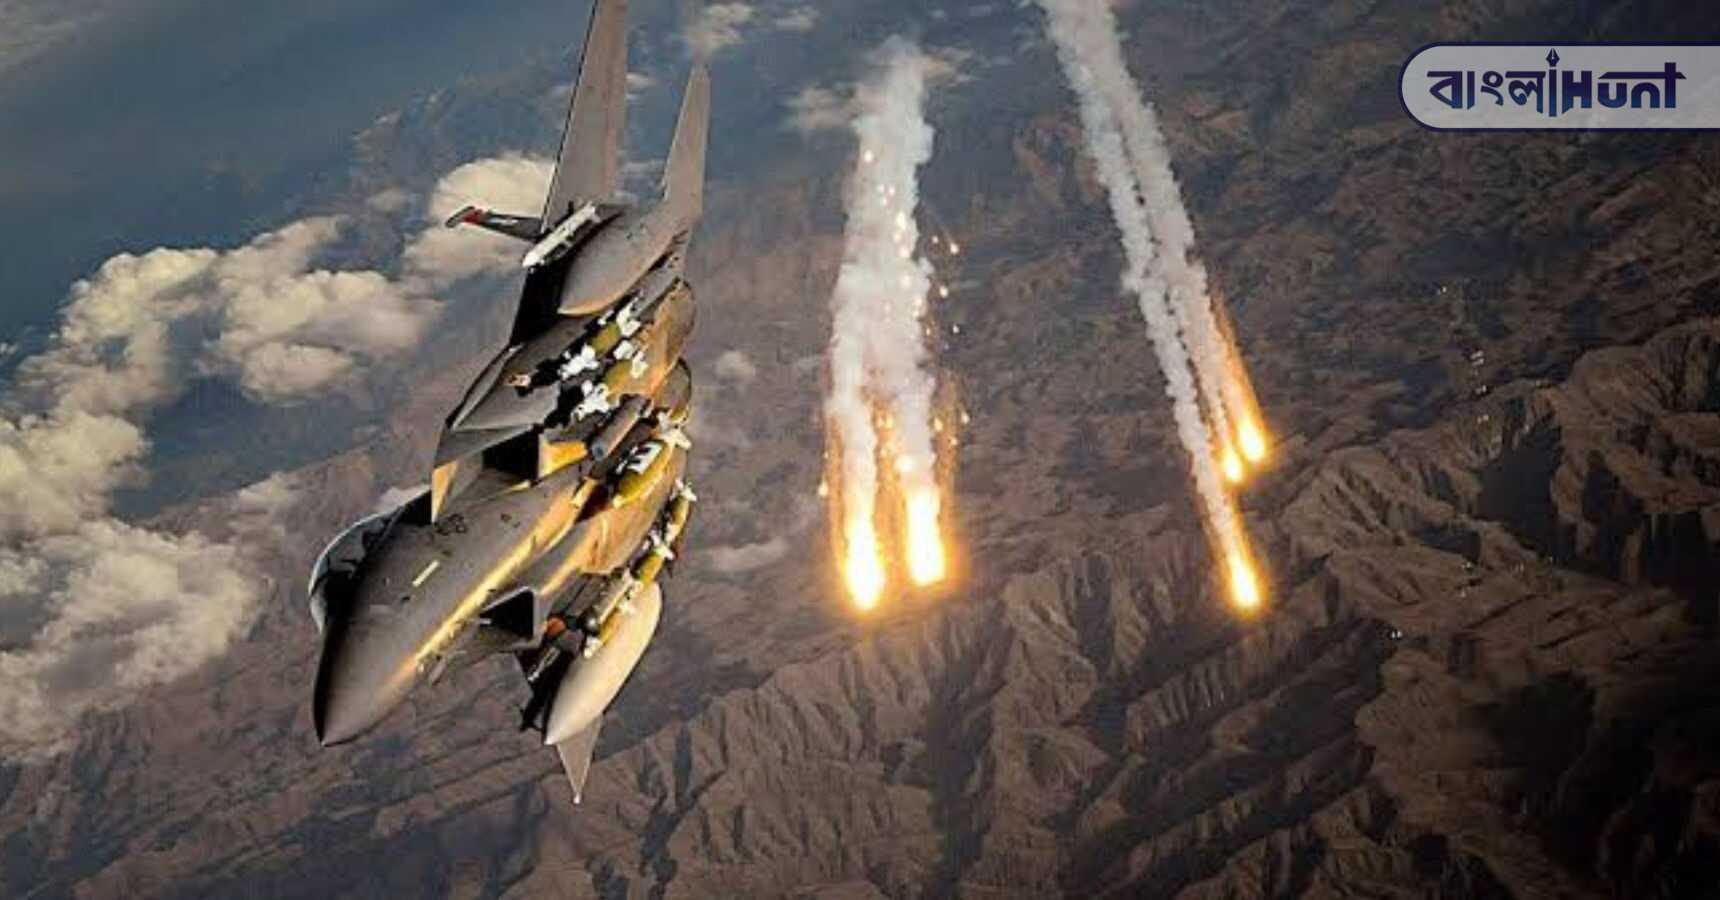 82 taliban militants were killed by an air strike of Afghanistan army